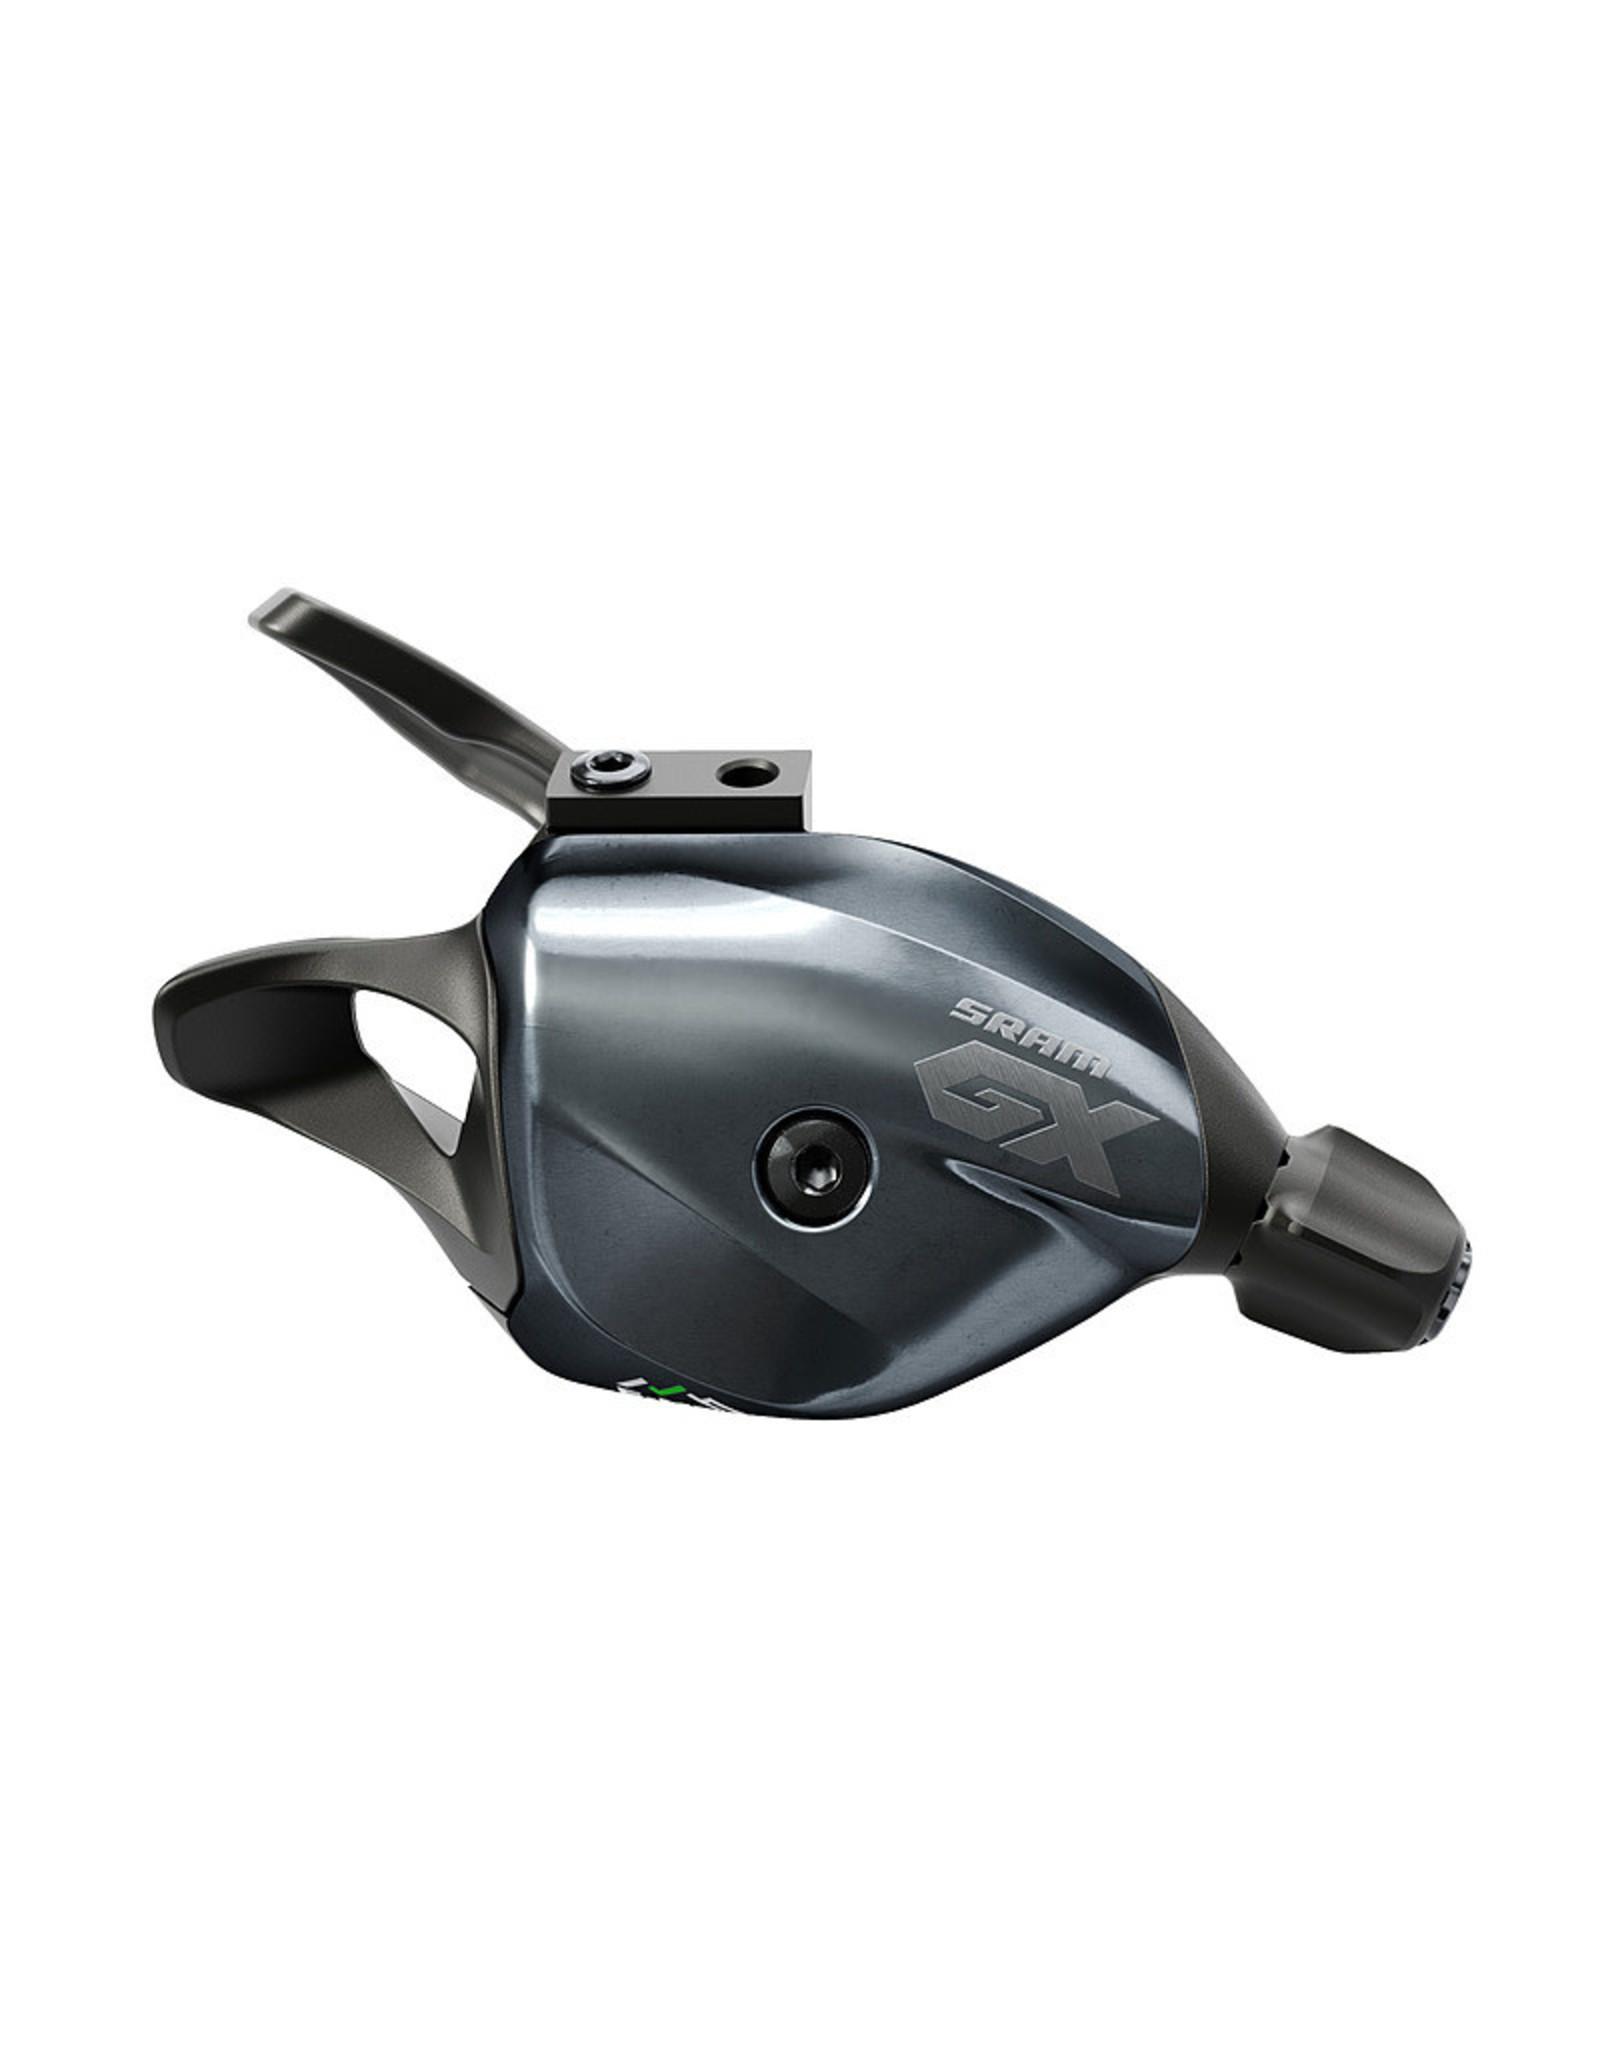 SRAM Shifter SRAM GX Eagle Rear 12-Speed,Discrete Clamp, Lunar